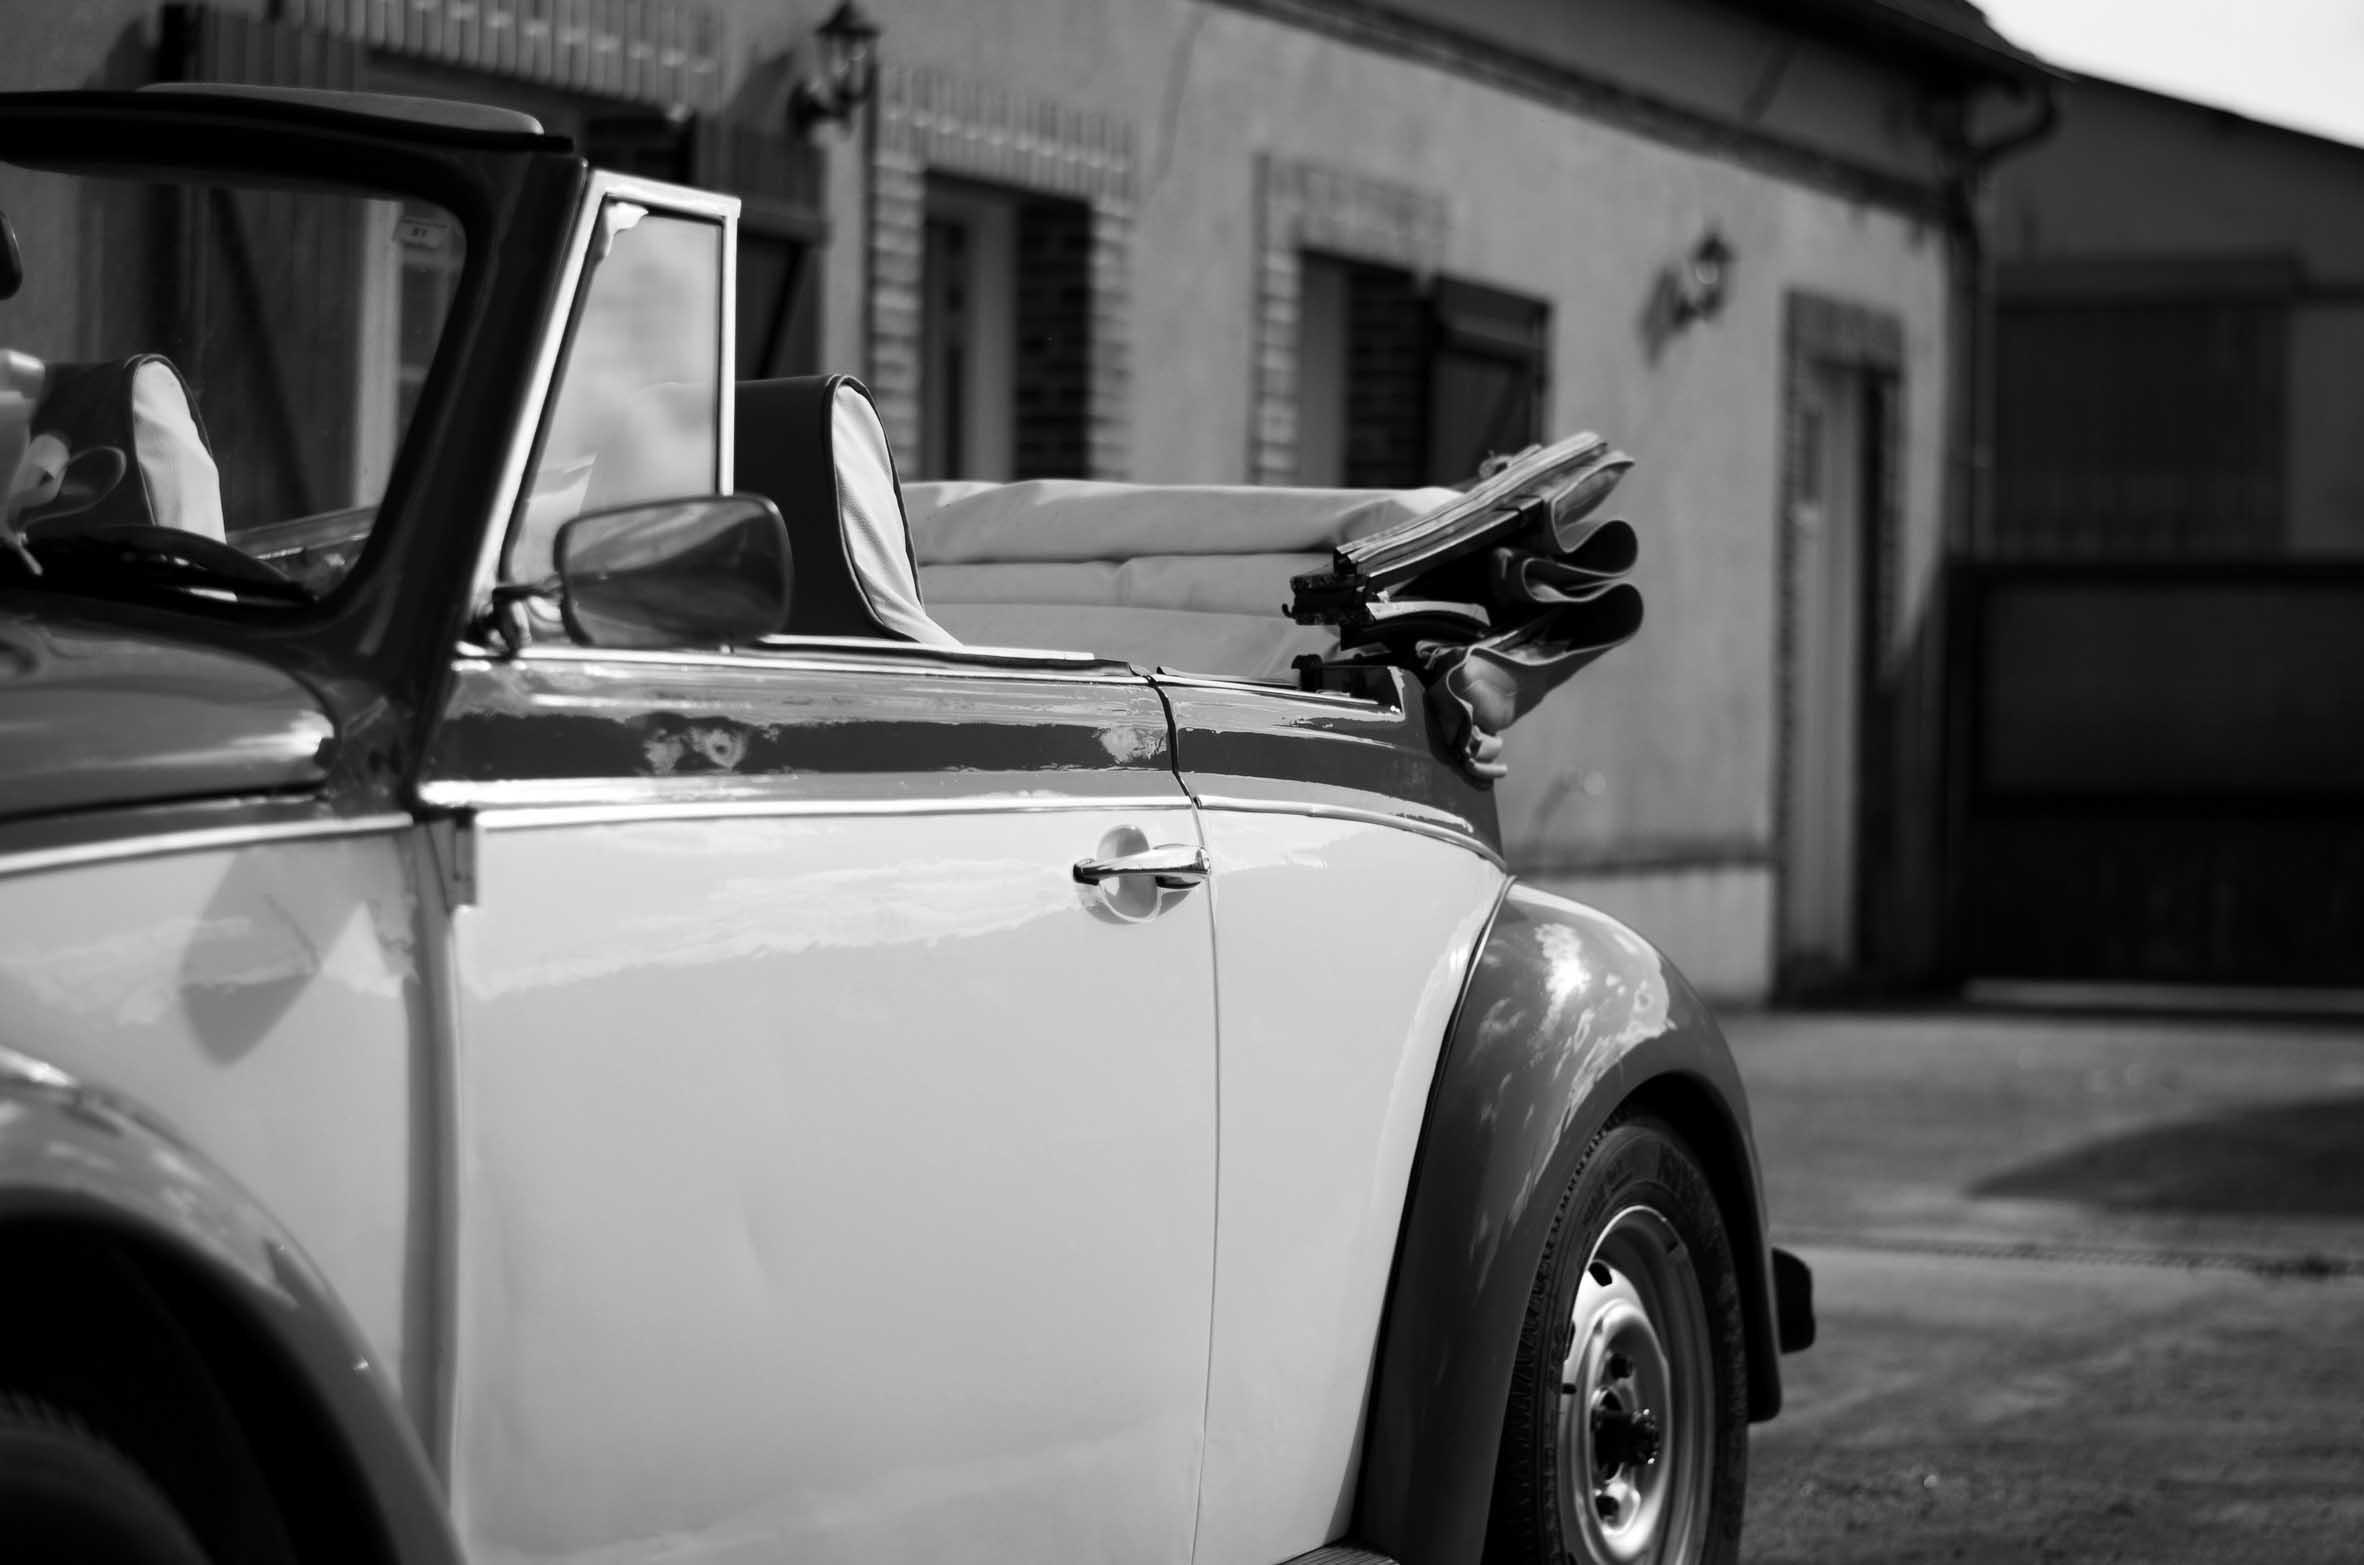 voitures anciennes gestion priv e caisse d epargne. Black Bedroom Furniture Sets. Home Design Ideas